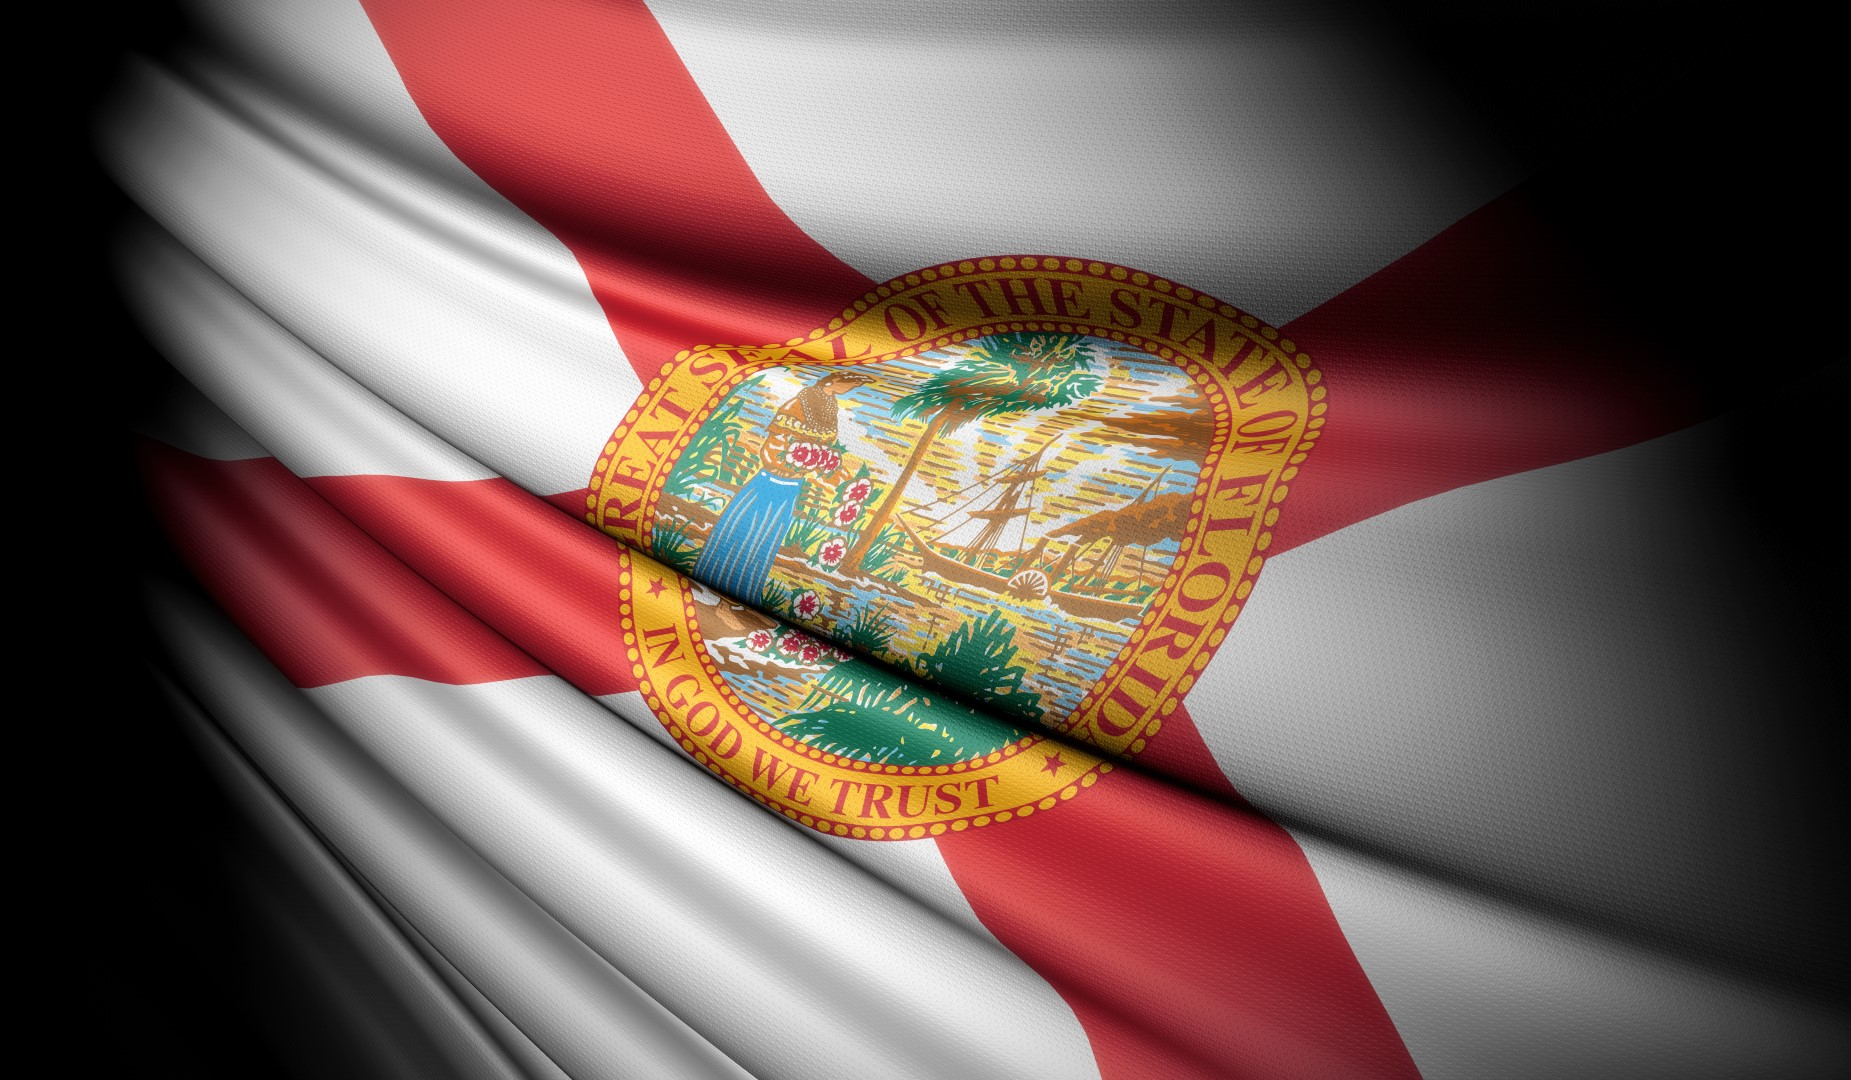 florida-flag-10.31-Large.jpg